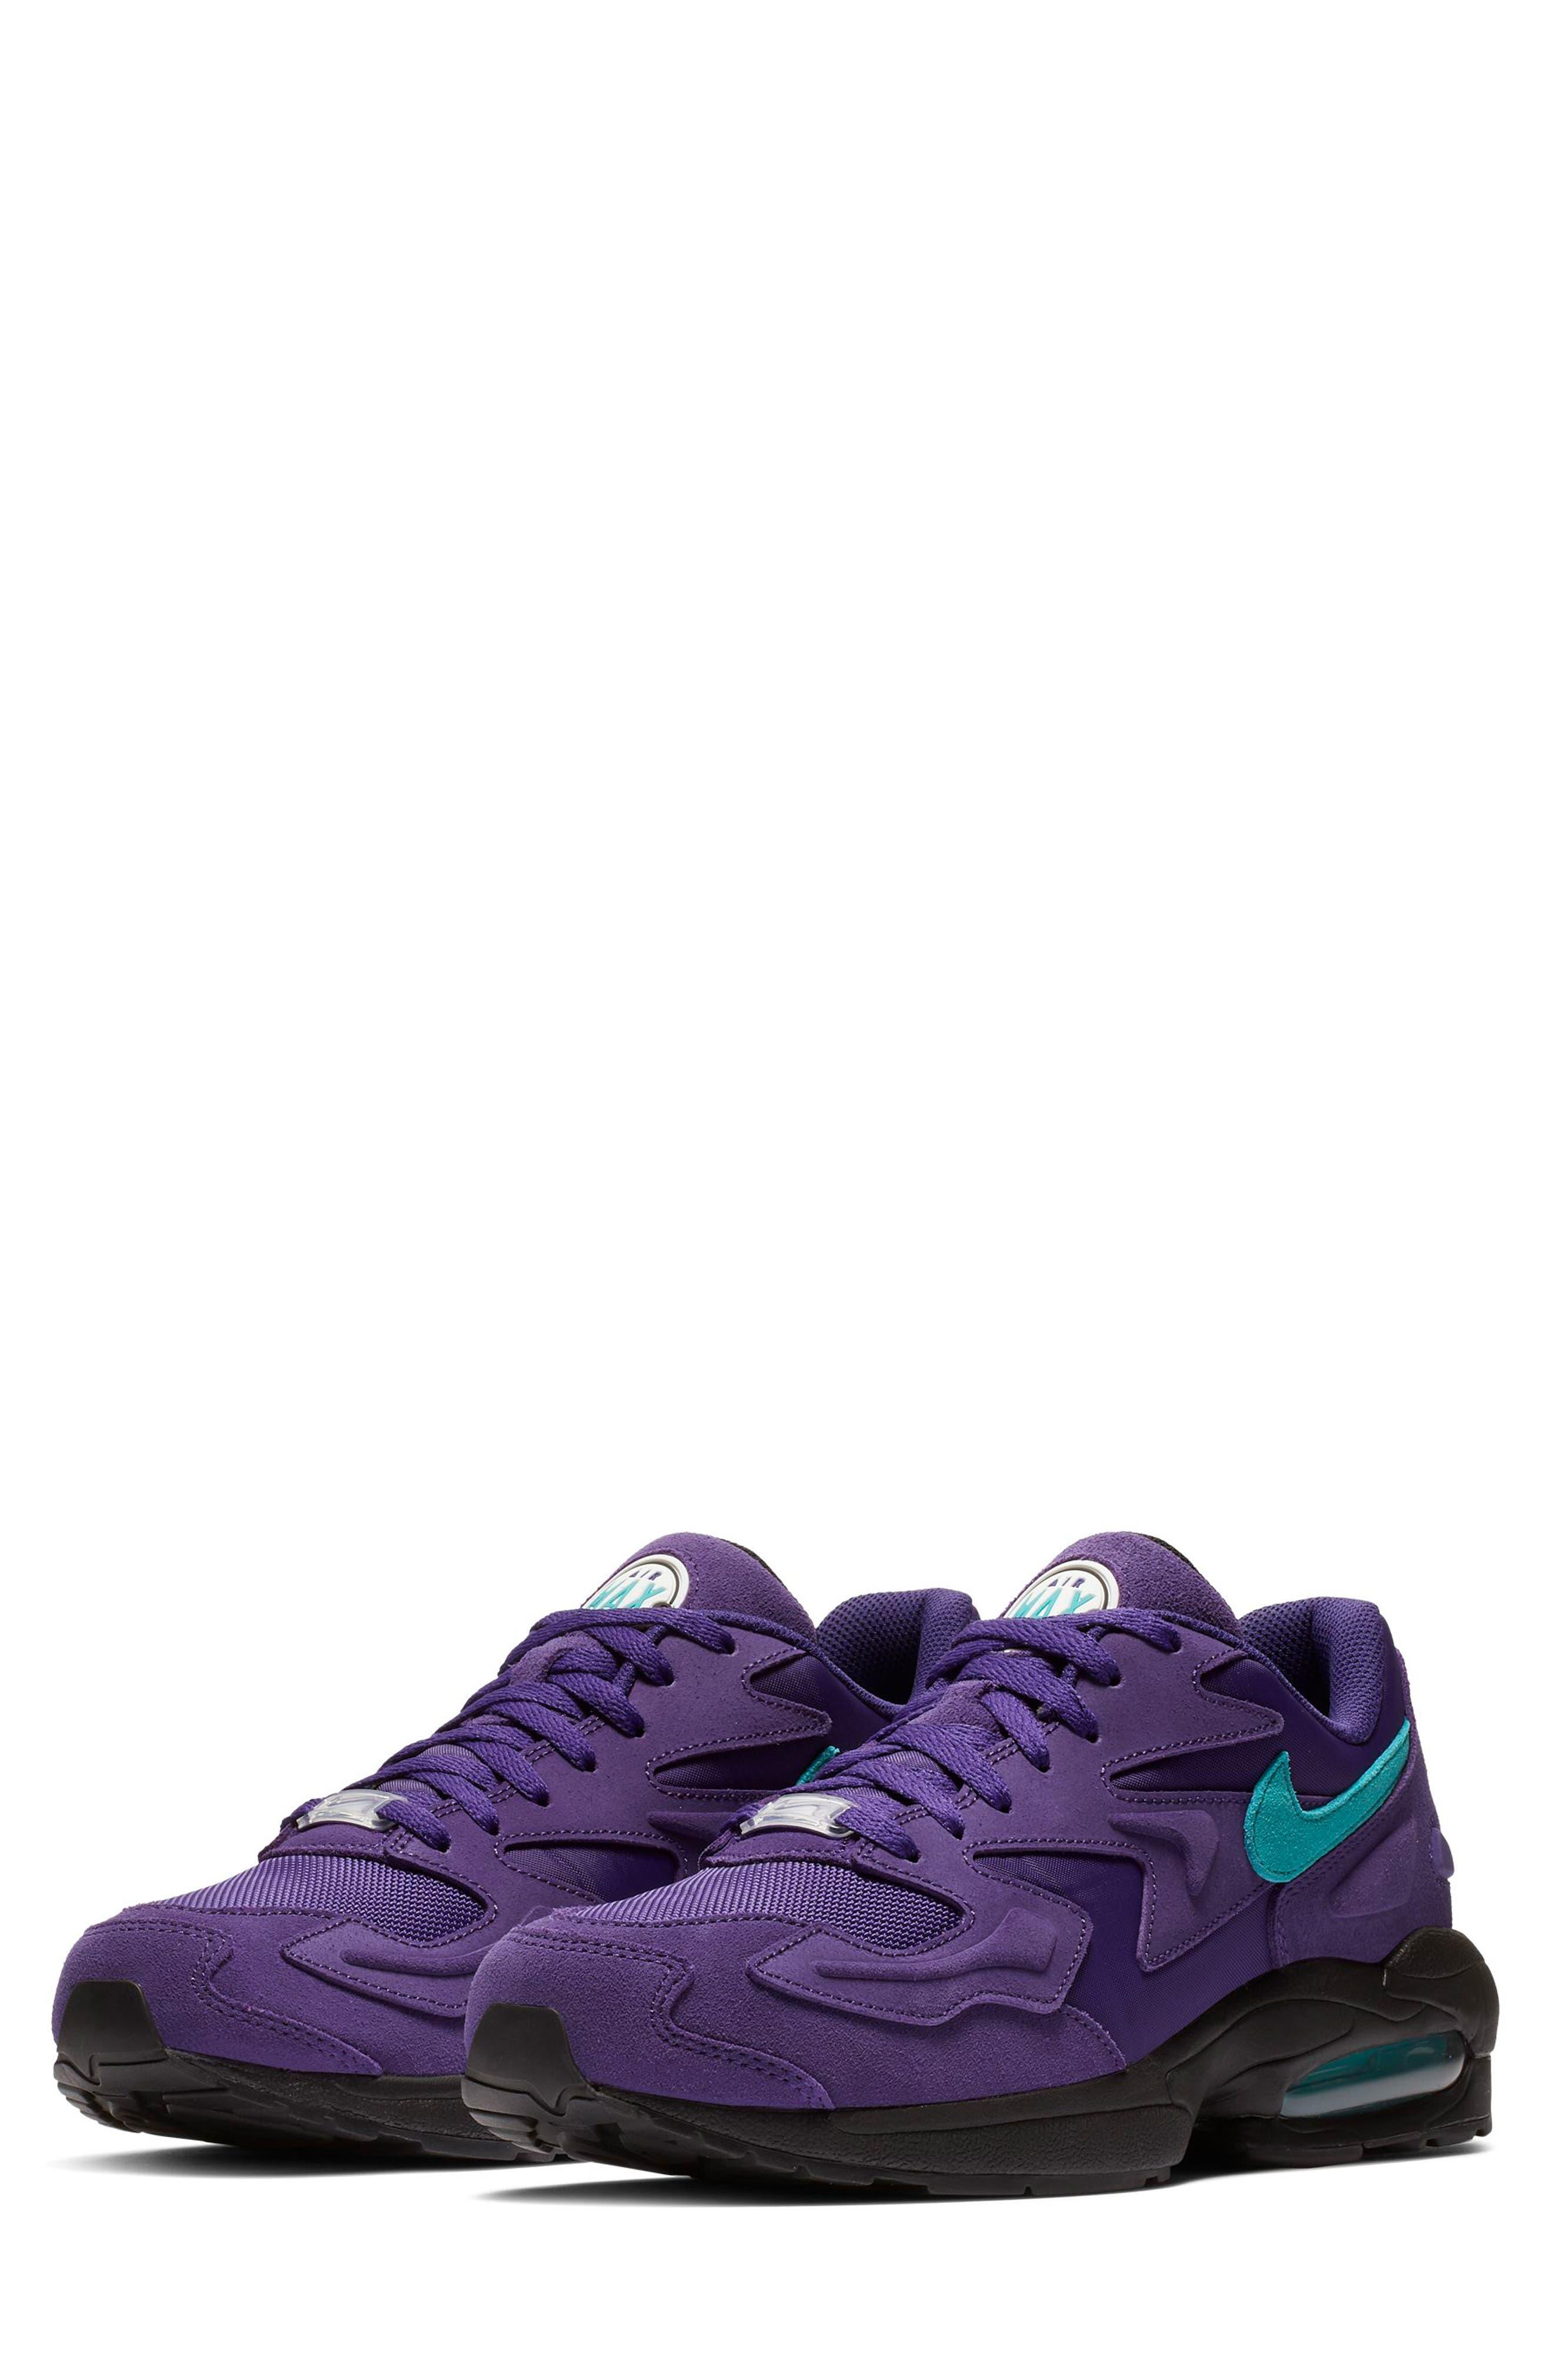 NIKE, Air Max2 Light Sneaker, Main thumbnail 1, color, PURPLE/ TEAL/ BLACK/ WHITE